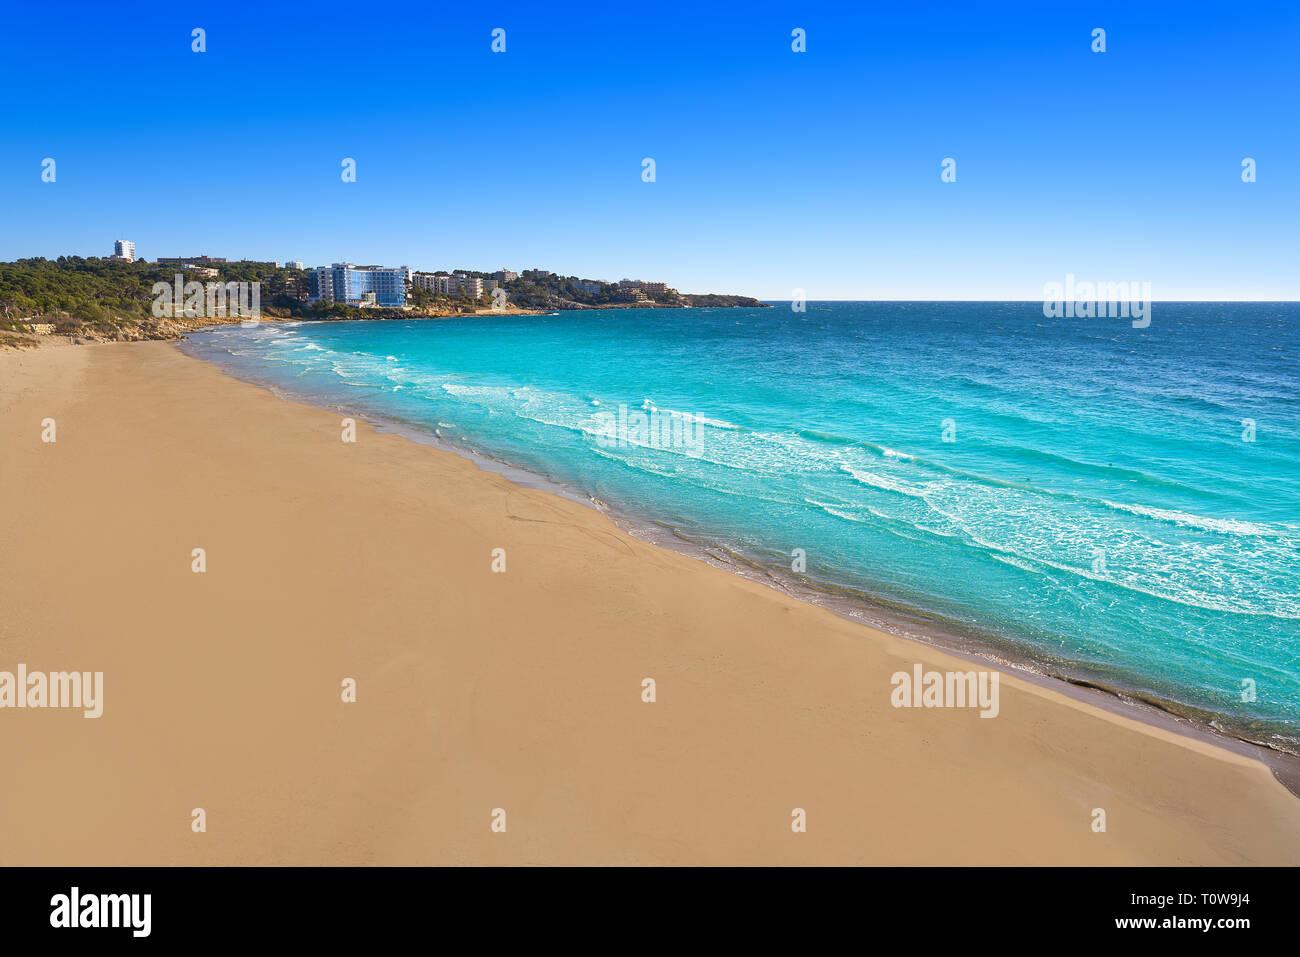 Platja Llarga Salou beach in Tarragona of Catalonia Stock Photo